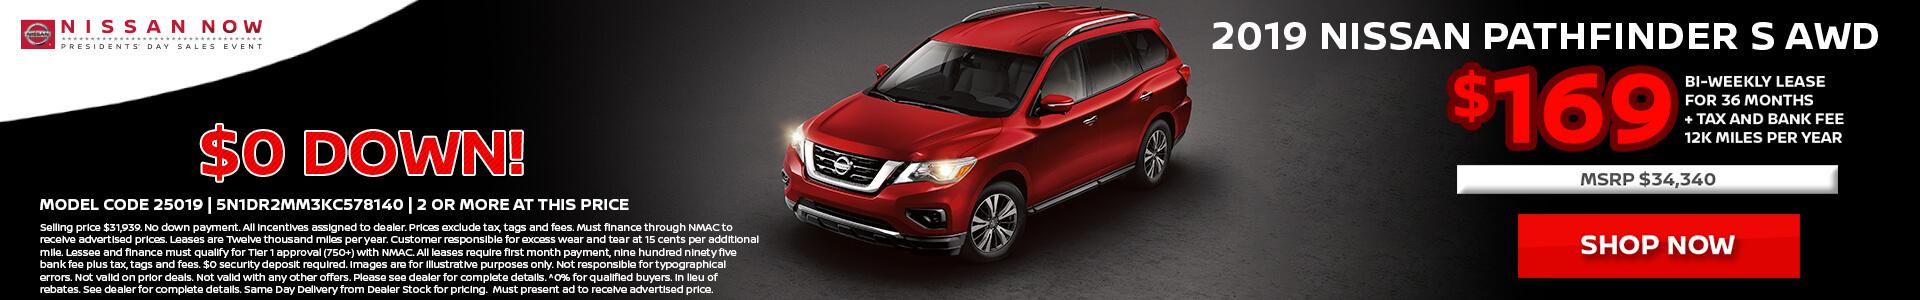 Nissan Pathfinder $338 Lease